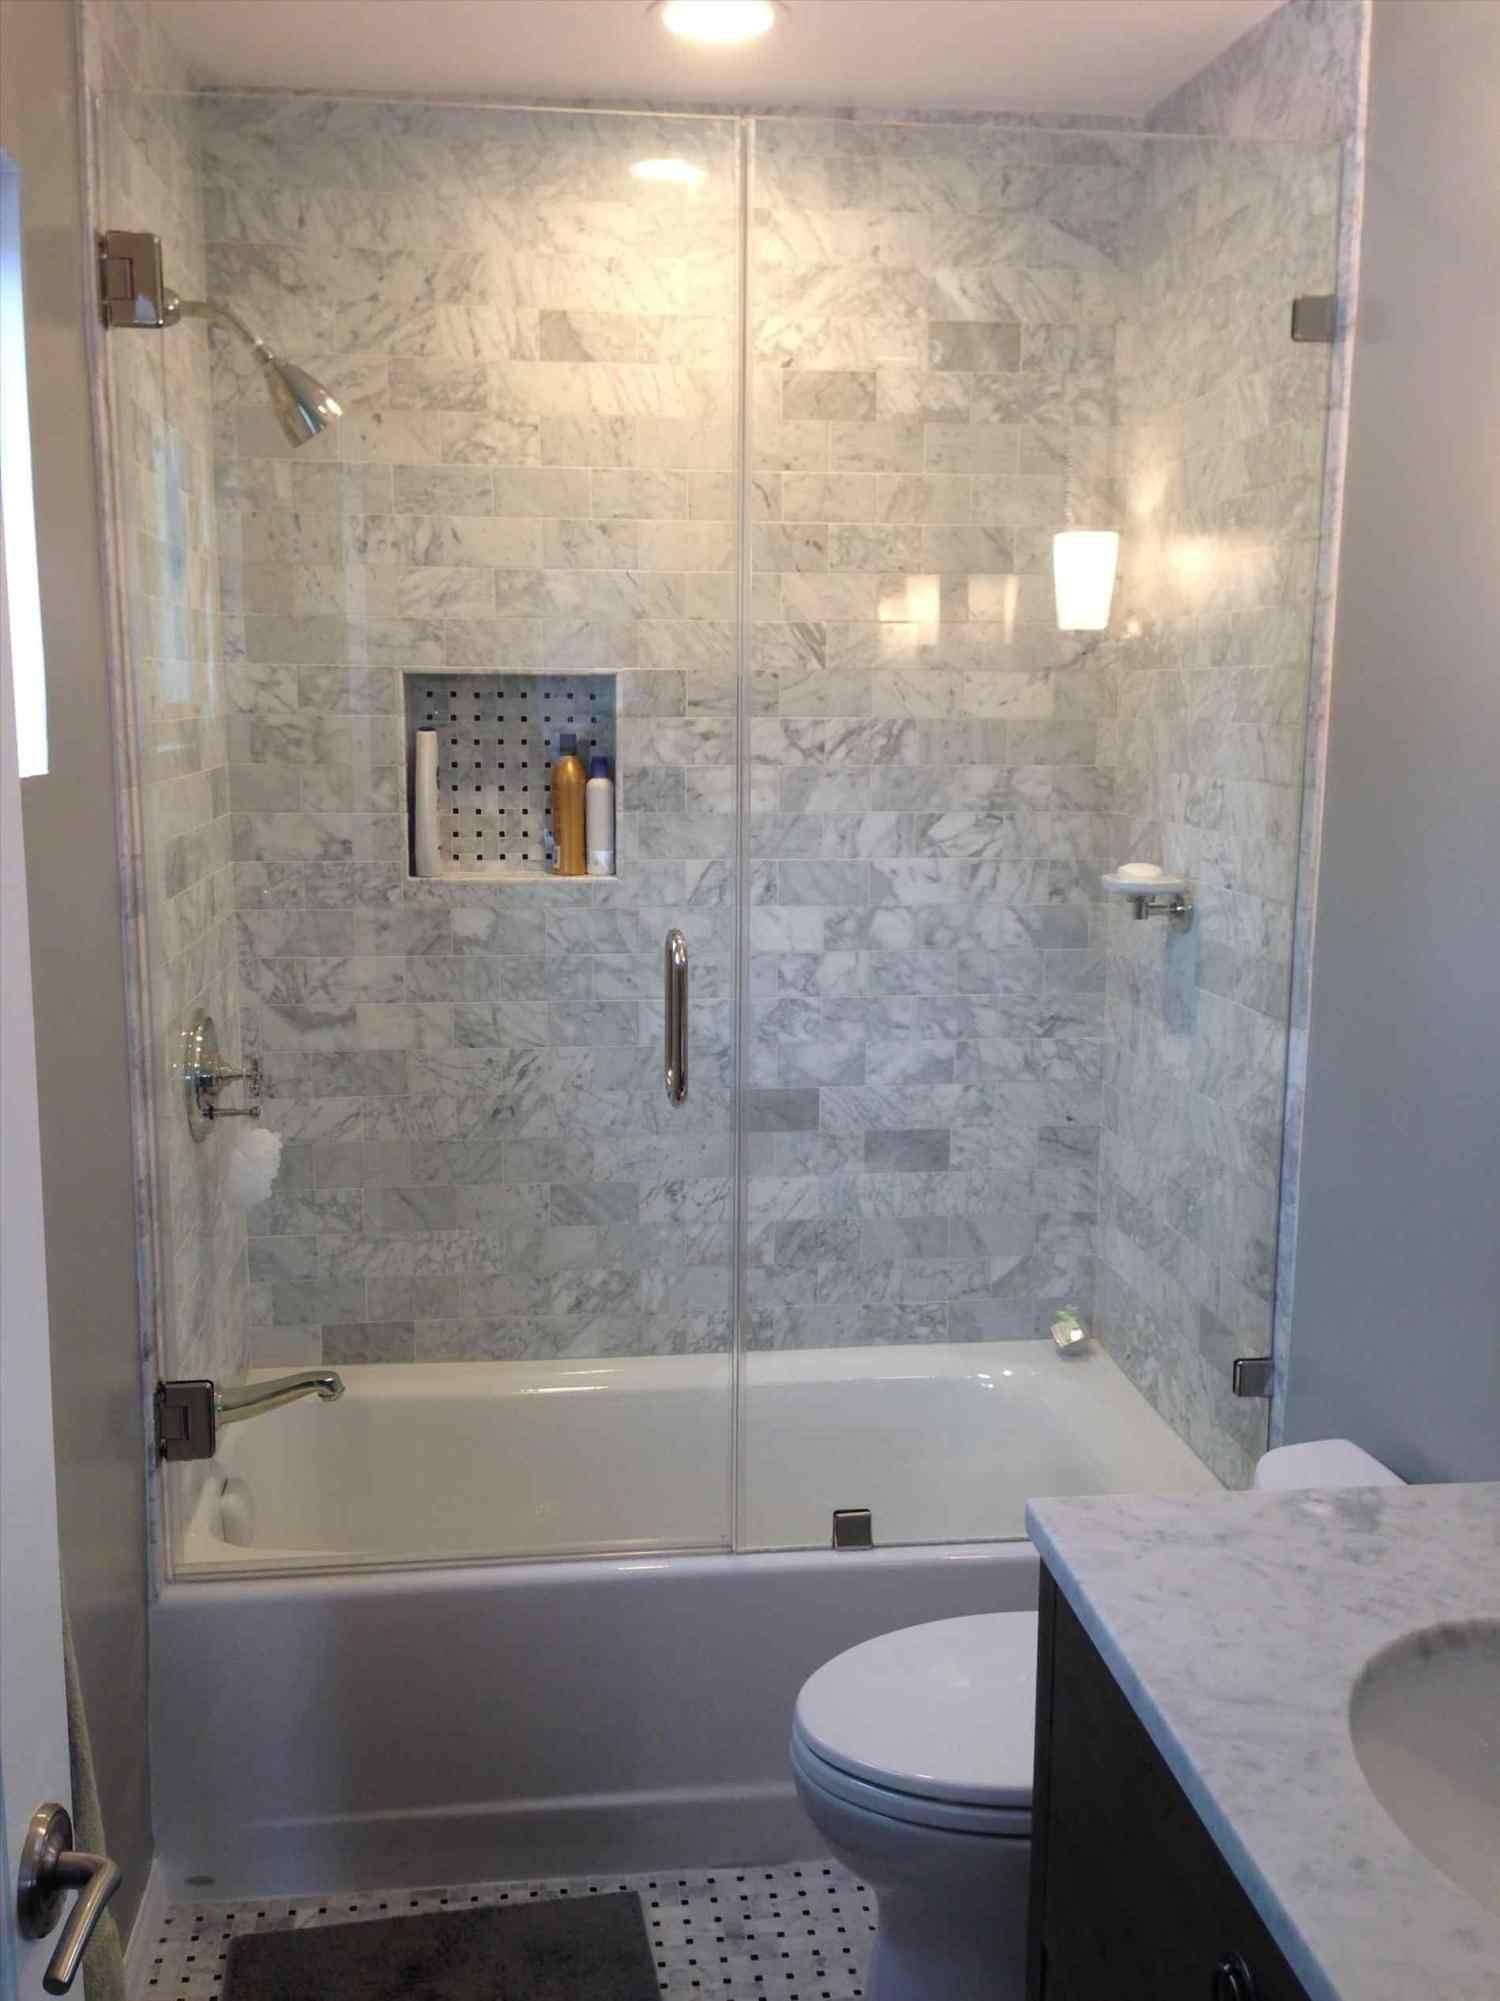 Tiles Gray Shower Tile Grey For A Refined Feel Matters Pinterest Bathroom Remodel Shower Bathroom Tub Shower Combo Bathroom Design Small